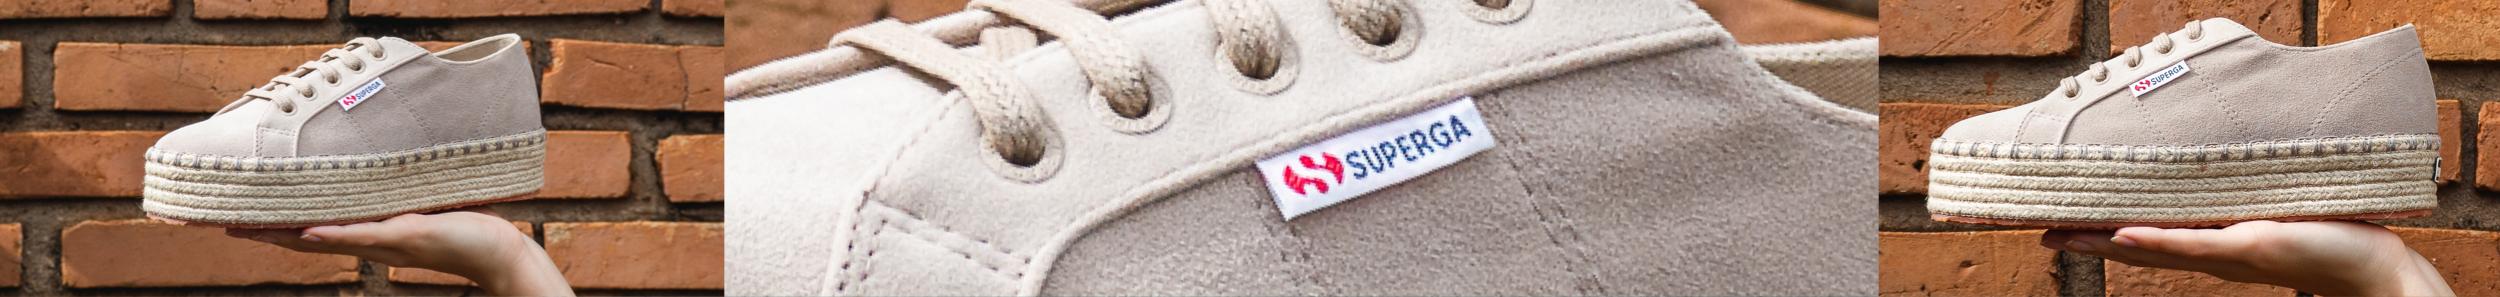 banner superga